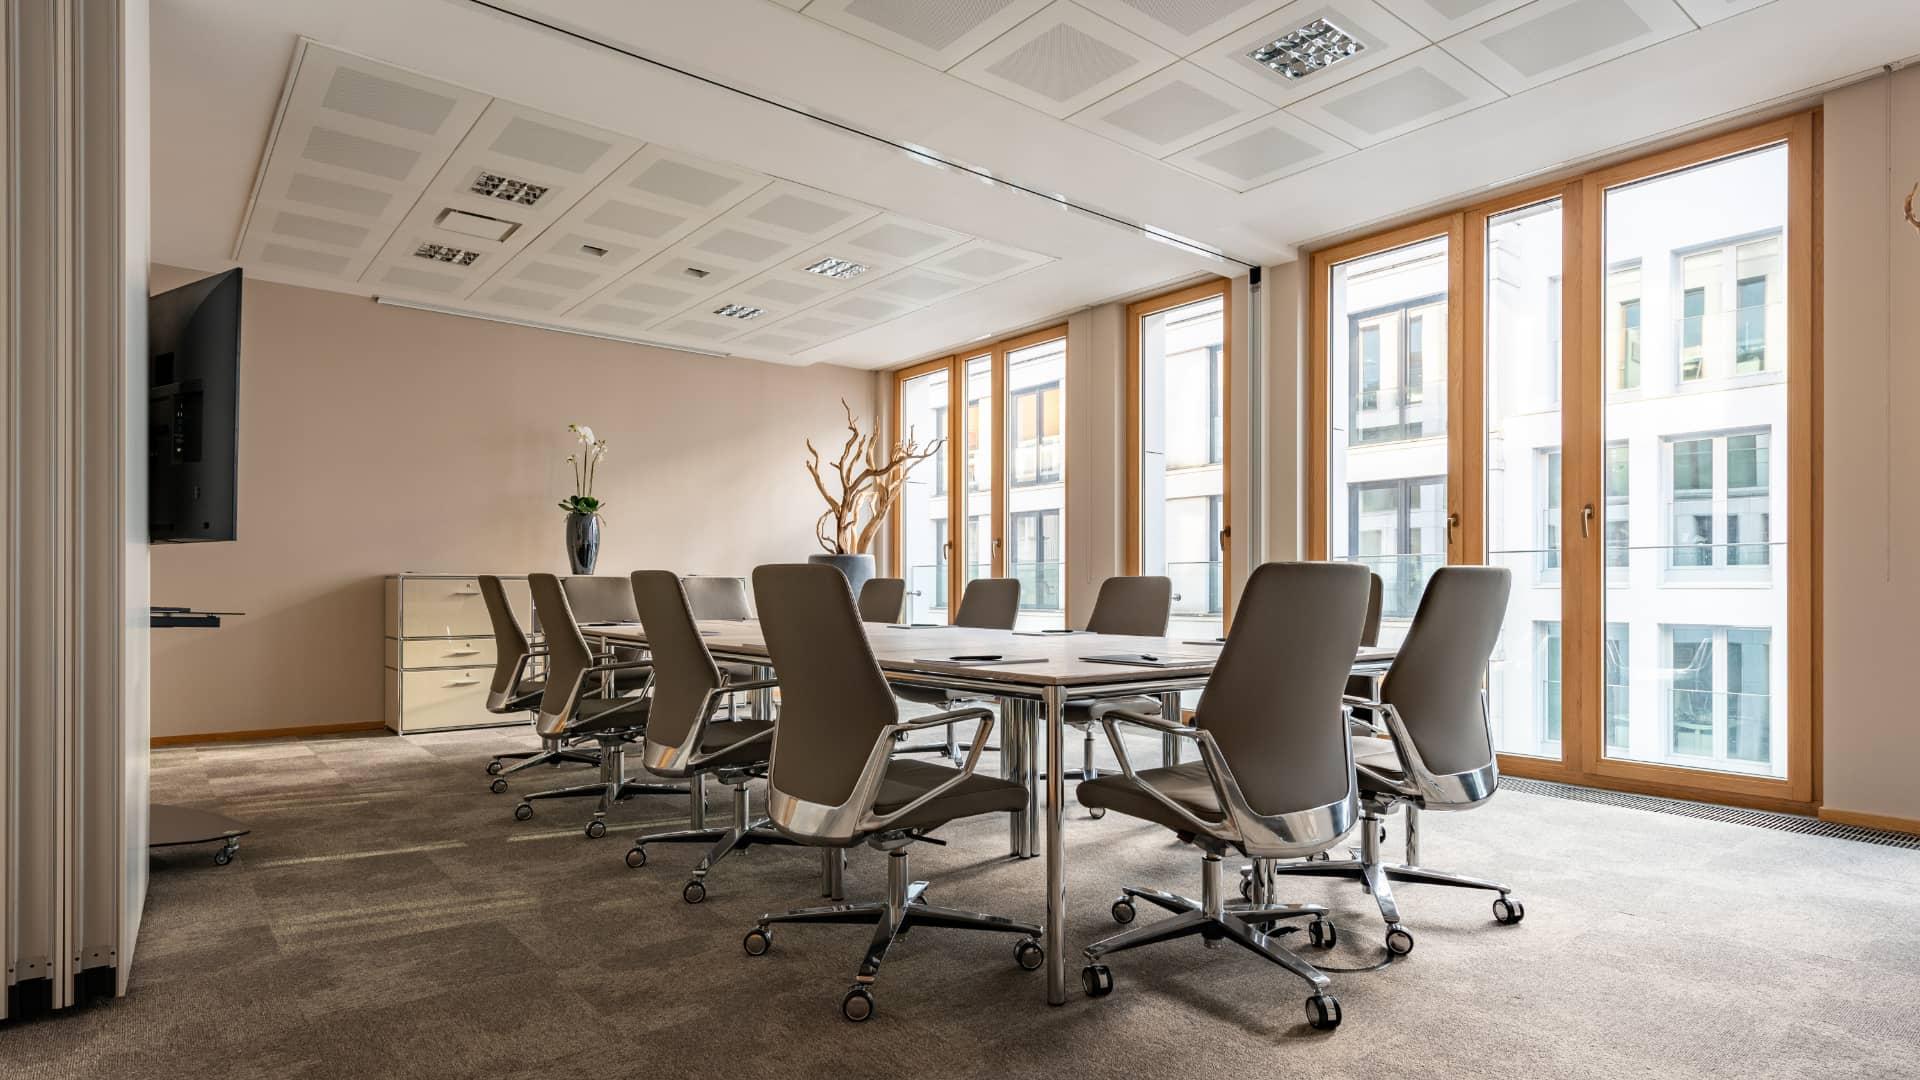 Neuer Wall meeting room